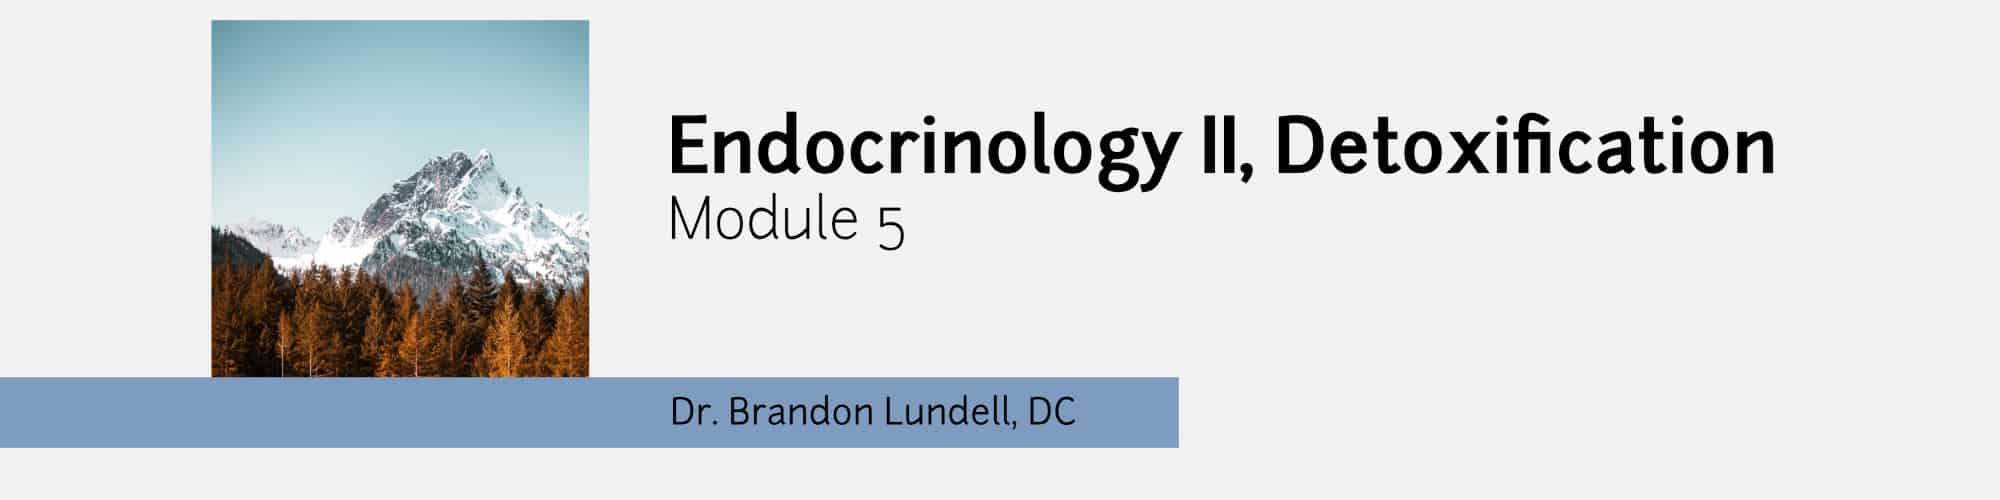 Module 5 - Endocrinology Two, Detox